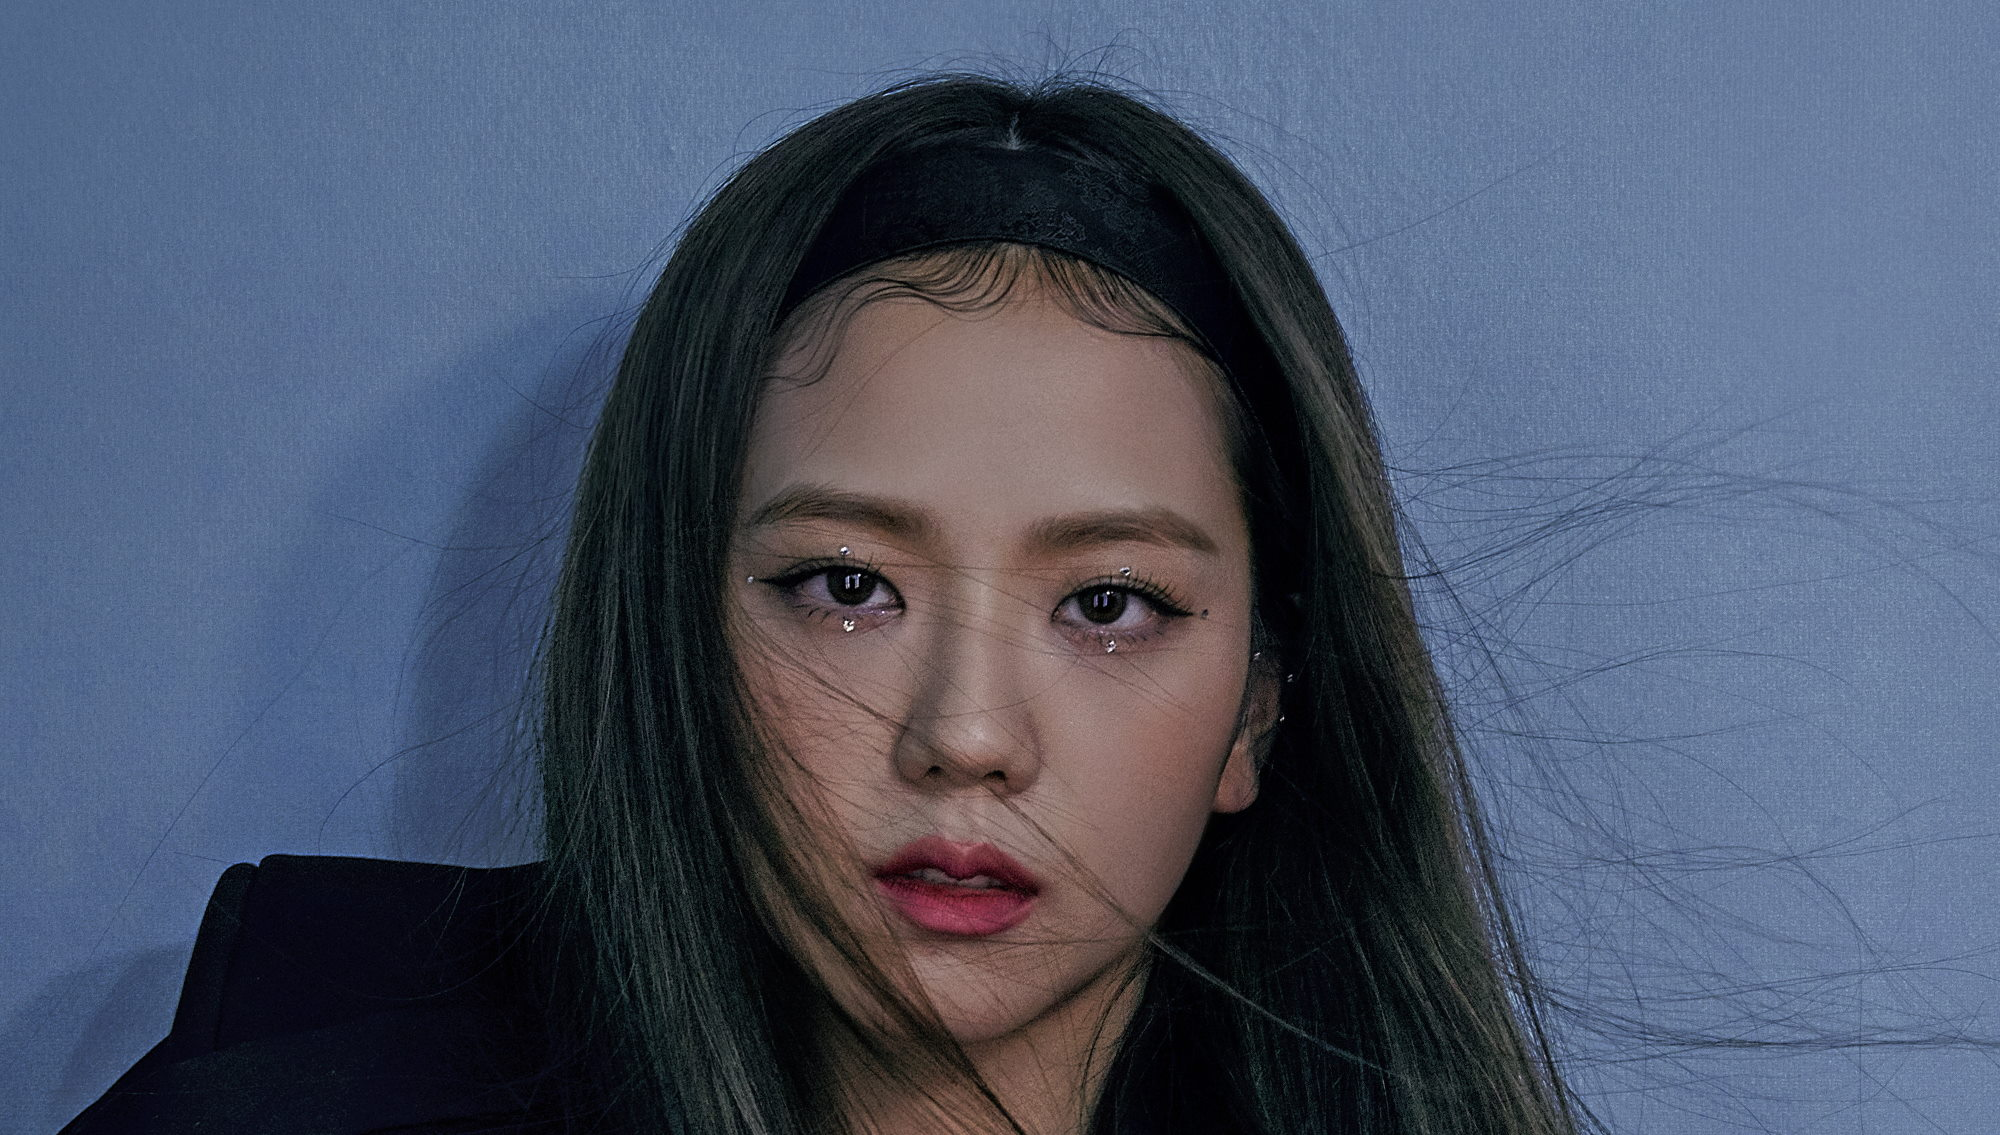 Blackpink Jisoo Profile